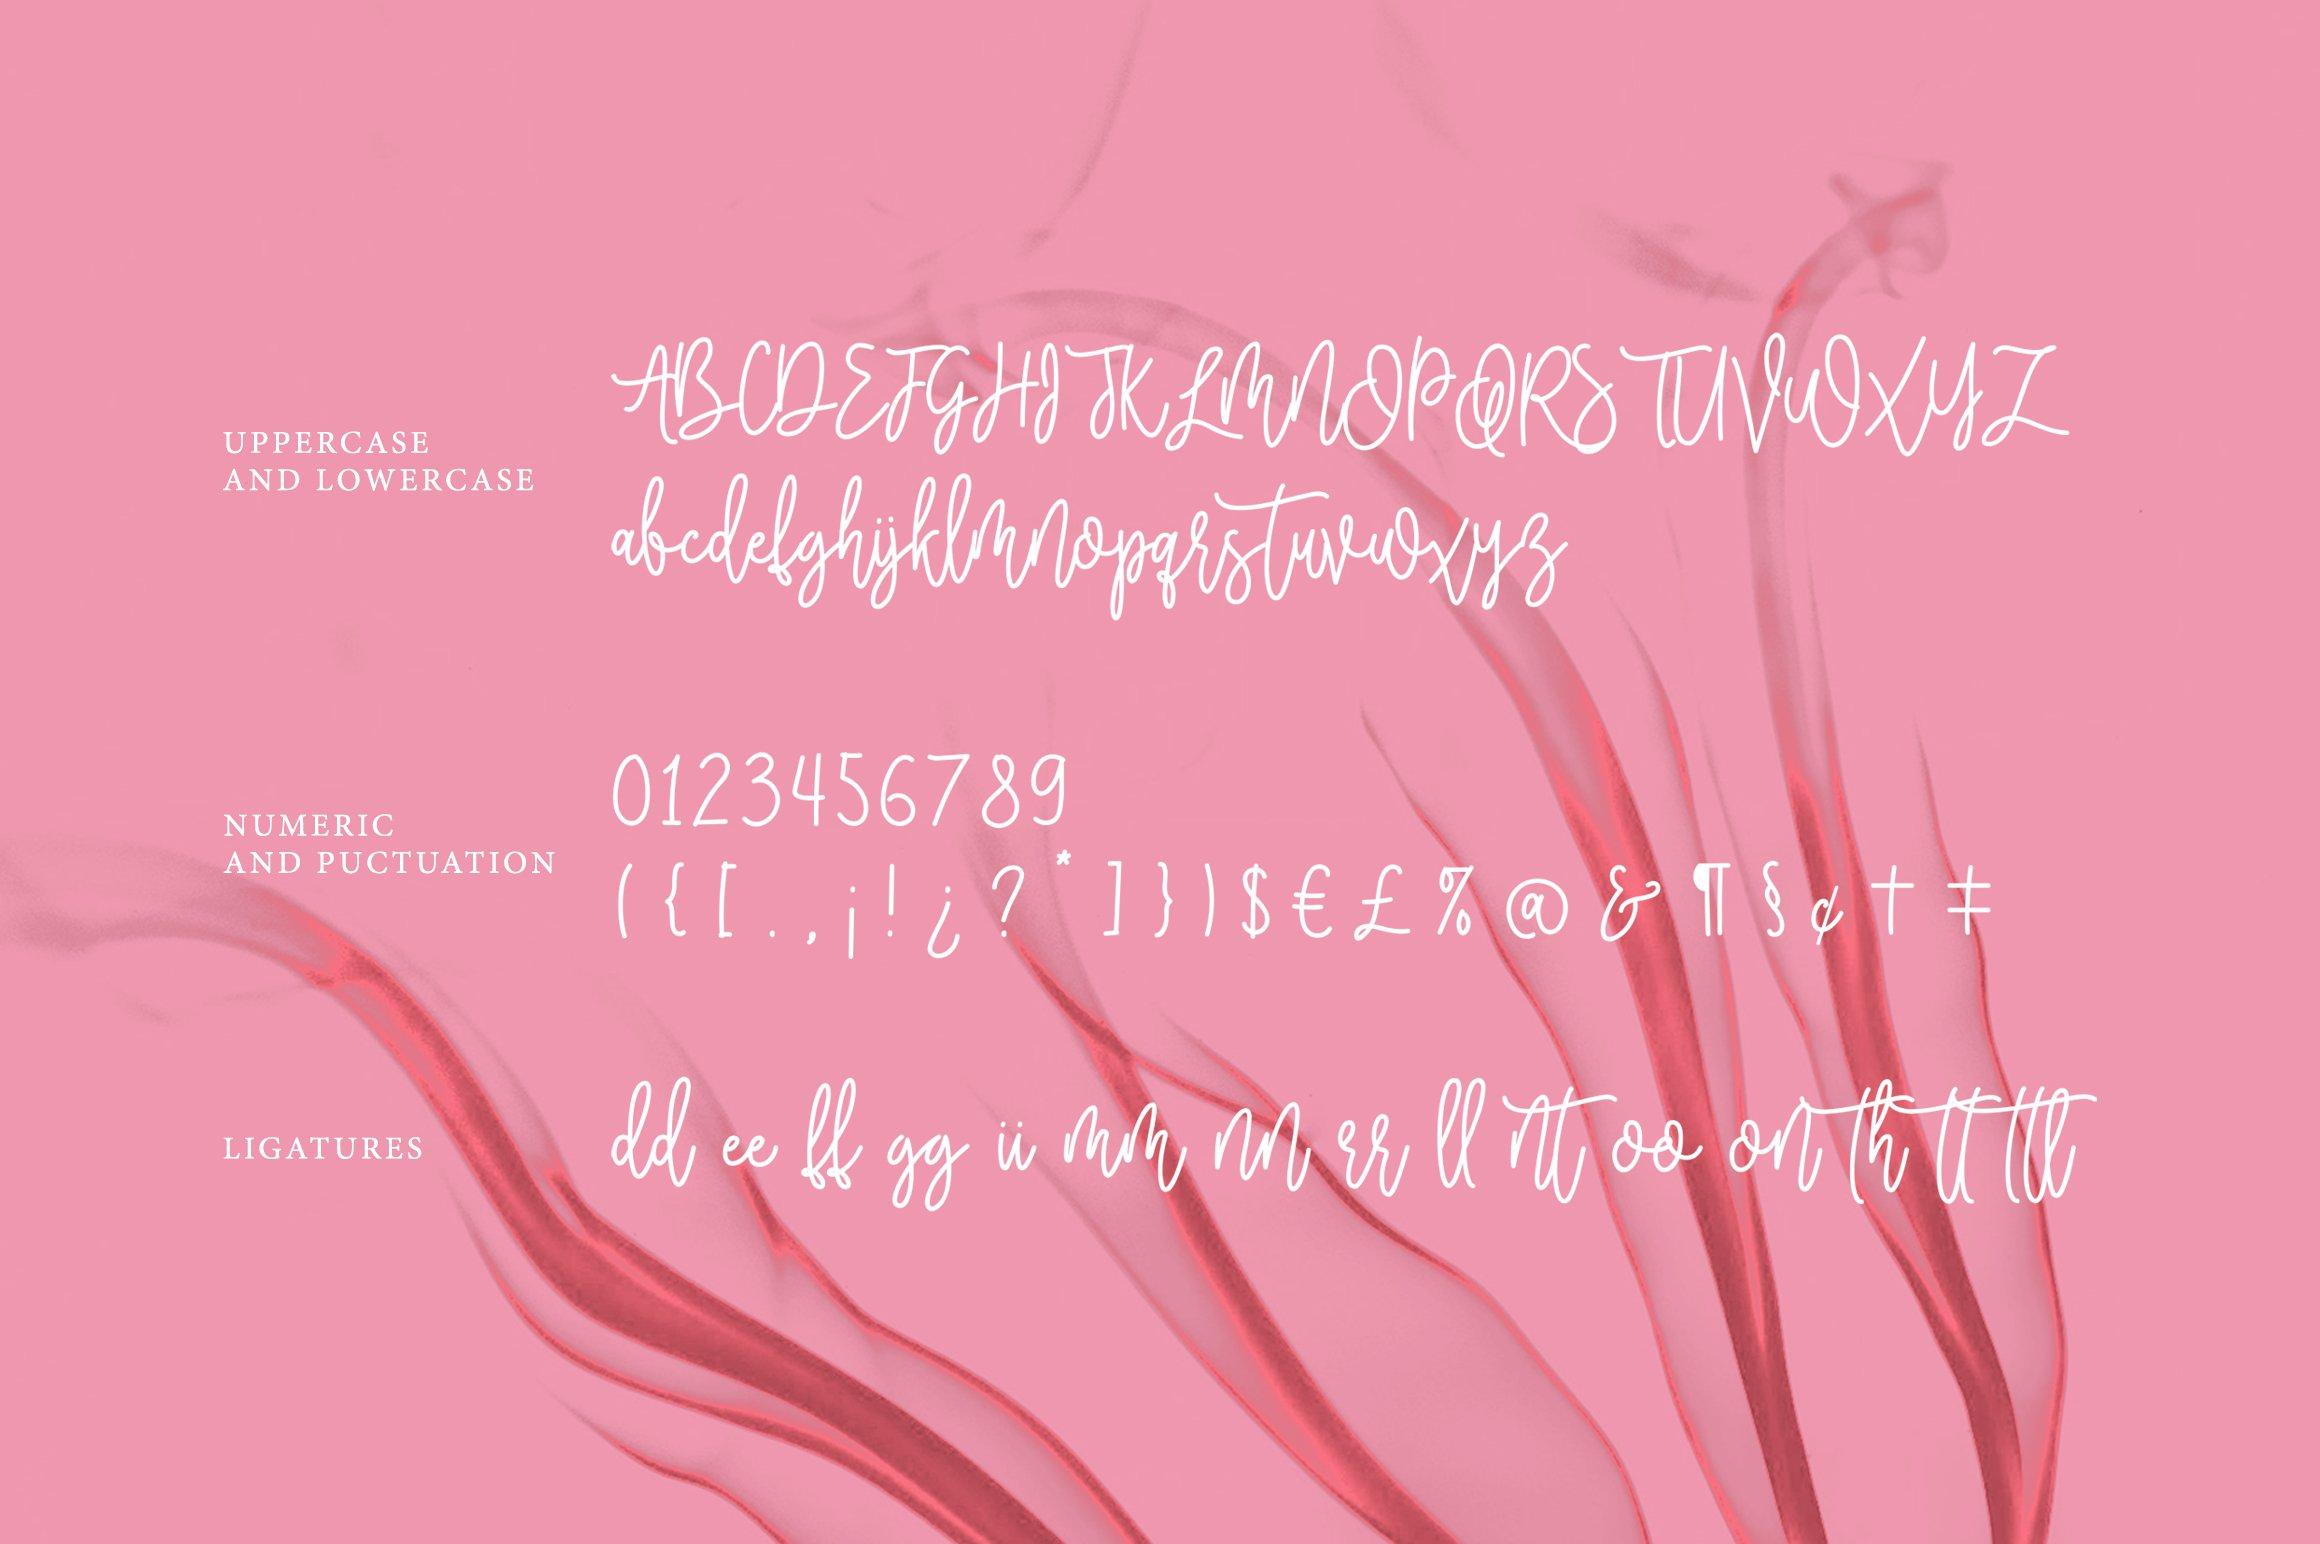 647acd2335ef0b53ca347faf48d3a10ce0b29901313e46b7e66bee4355692854